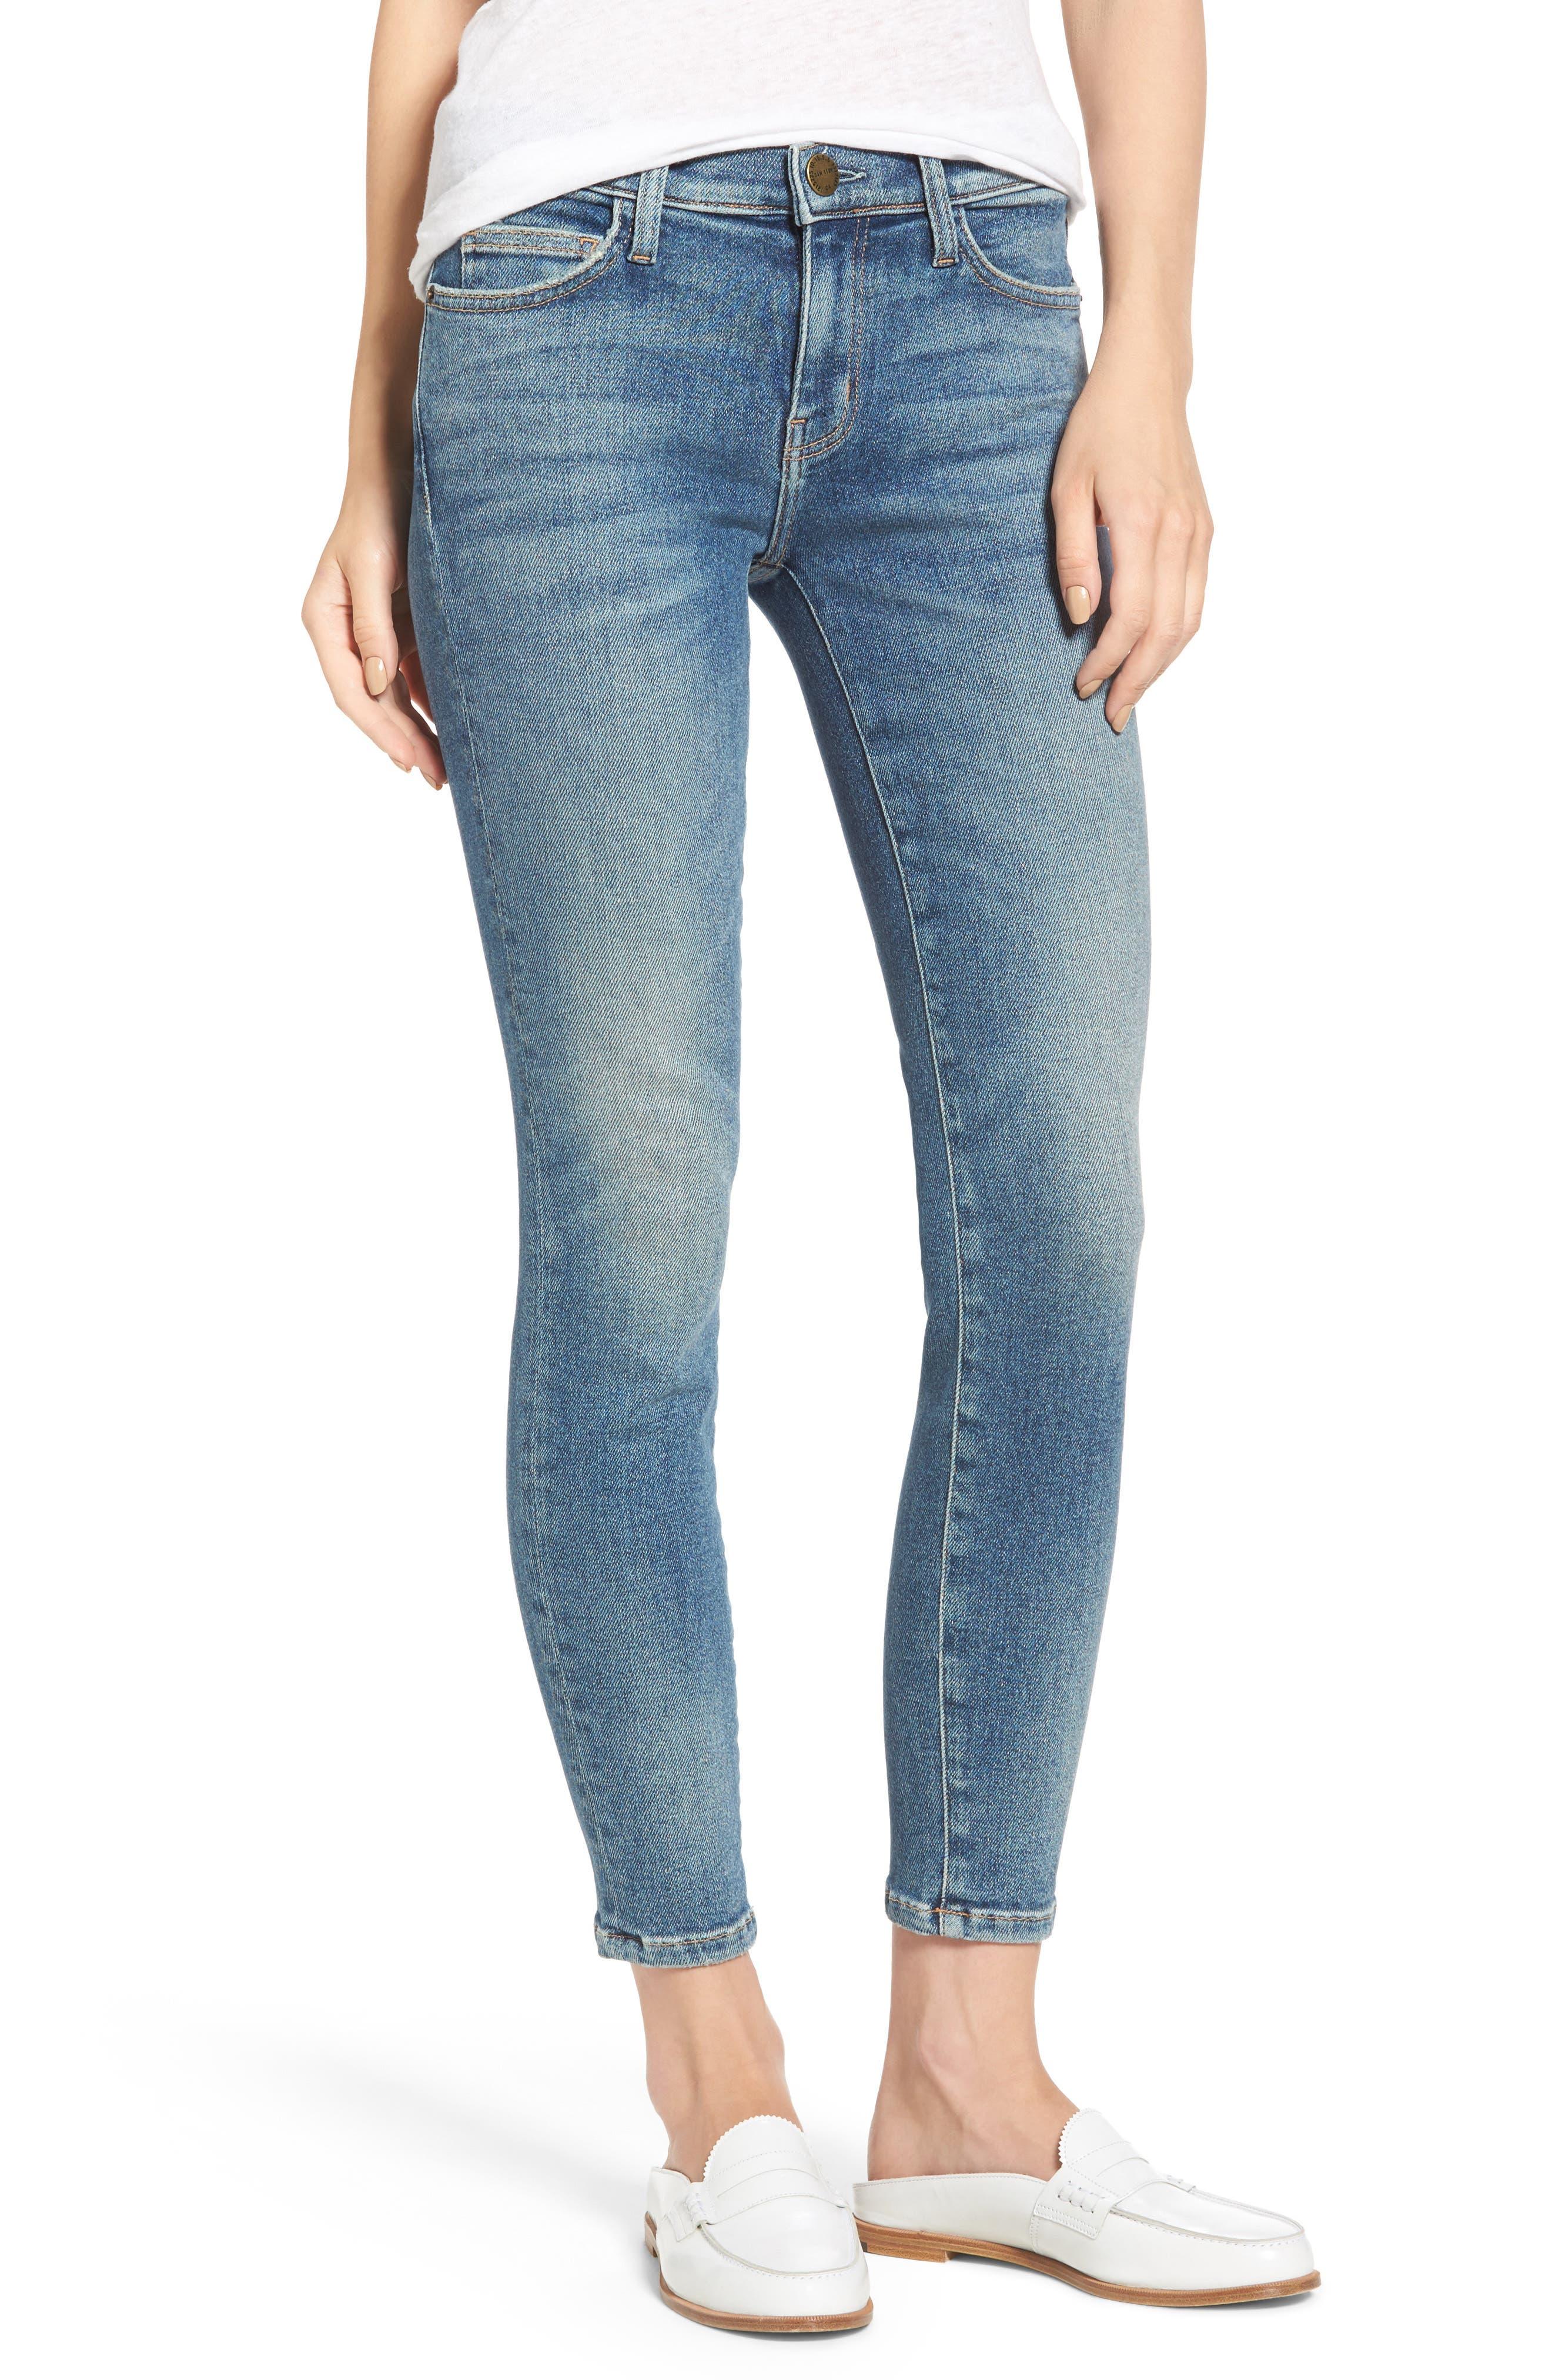 Main Image - Current/Elliott The Stiletto Ankle Skinny Jeans (Ashurst)